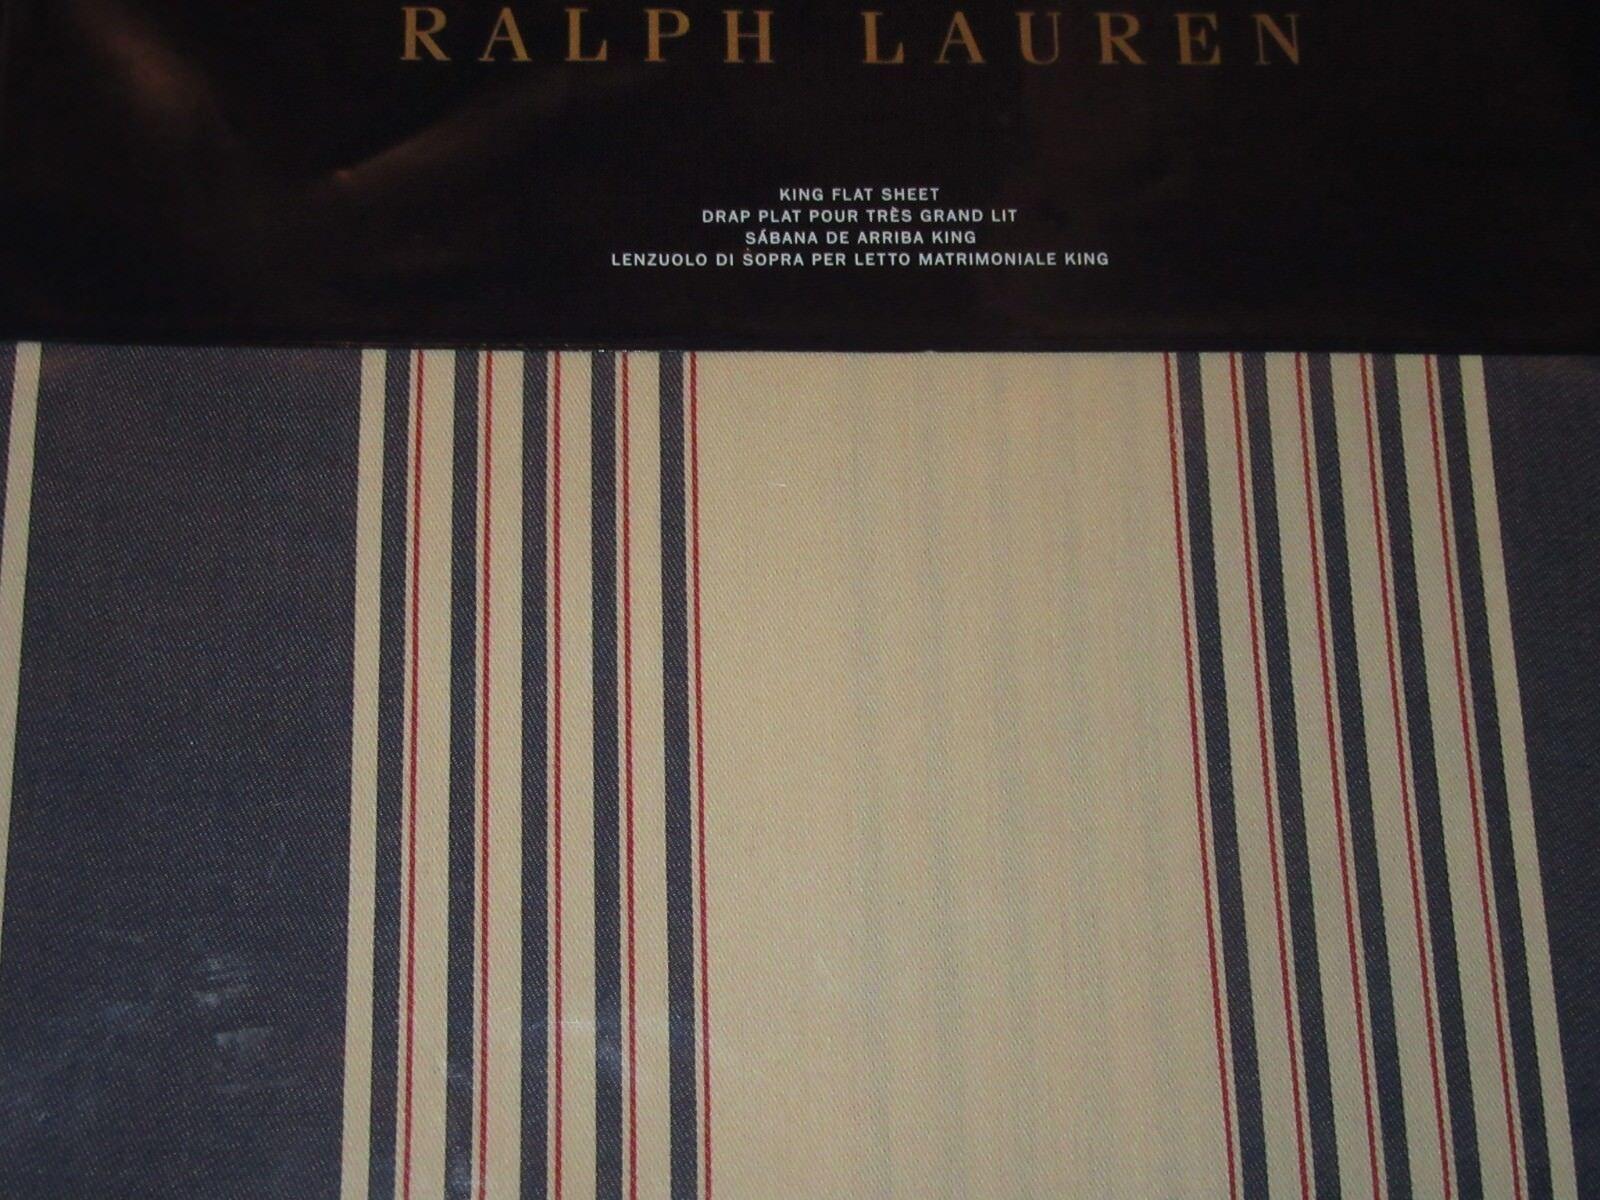 Ralph Lauren Saranac Peak Cotton KING Flat Sheet Corbet Striped bluee Red Cream